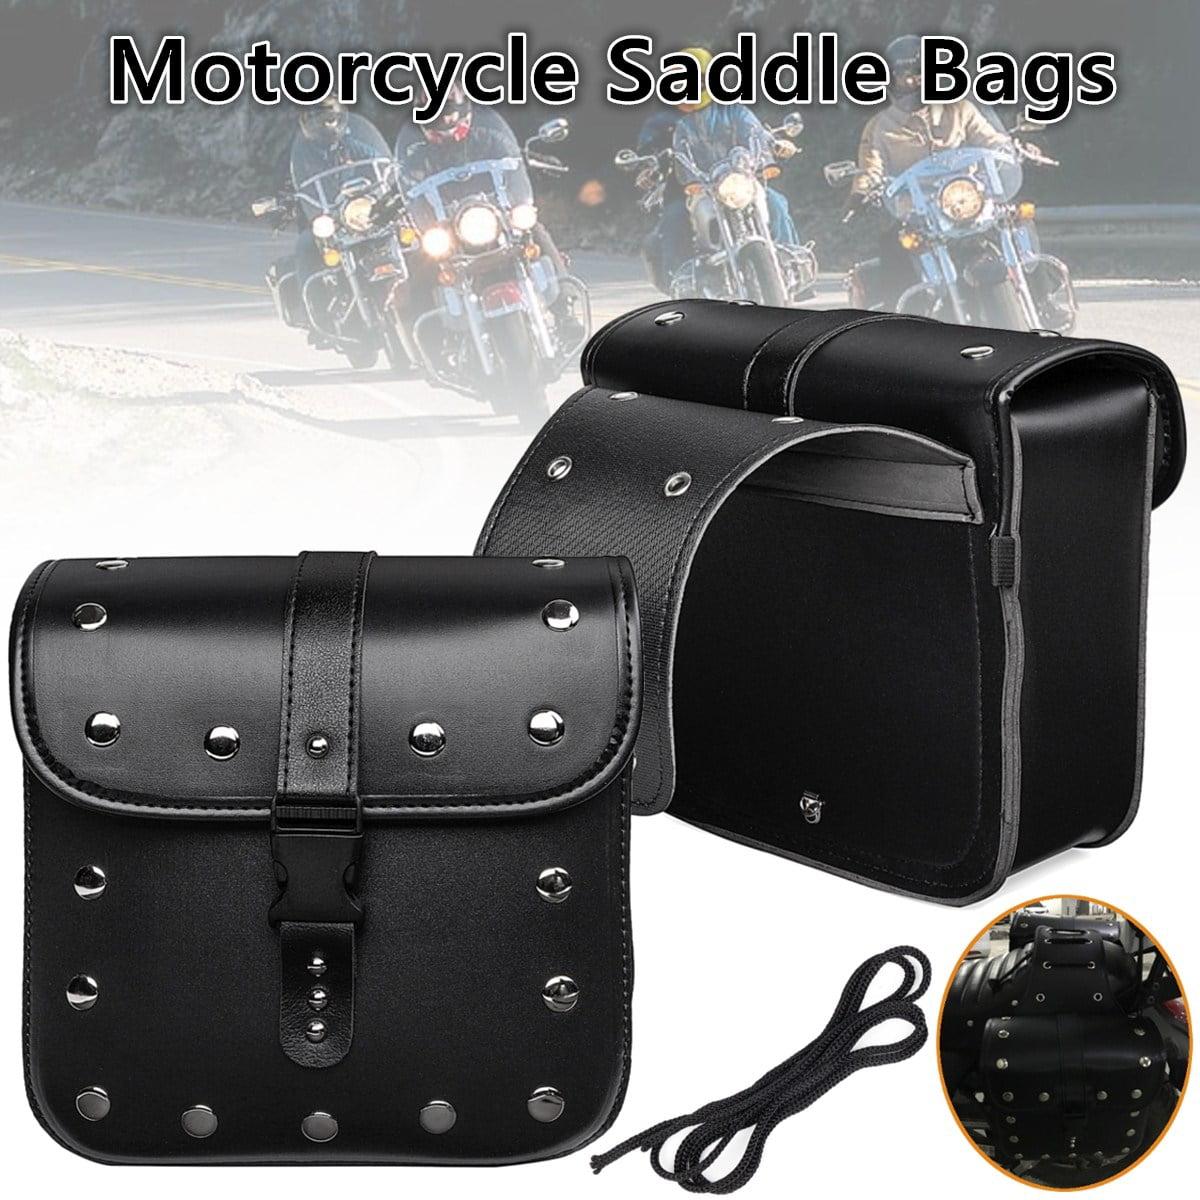 LN Black Universal Motorcycle Hard Saddlebag Saddle bags Trunk Bag Luggage